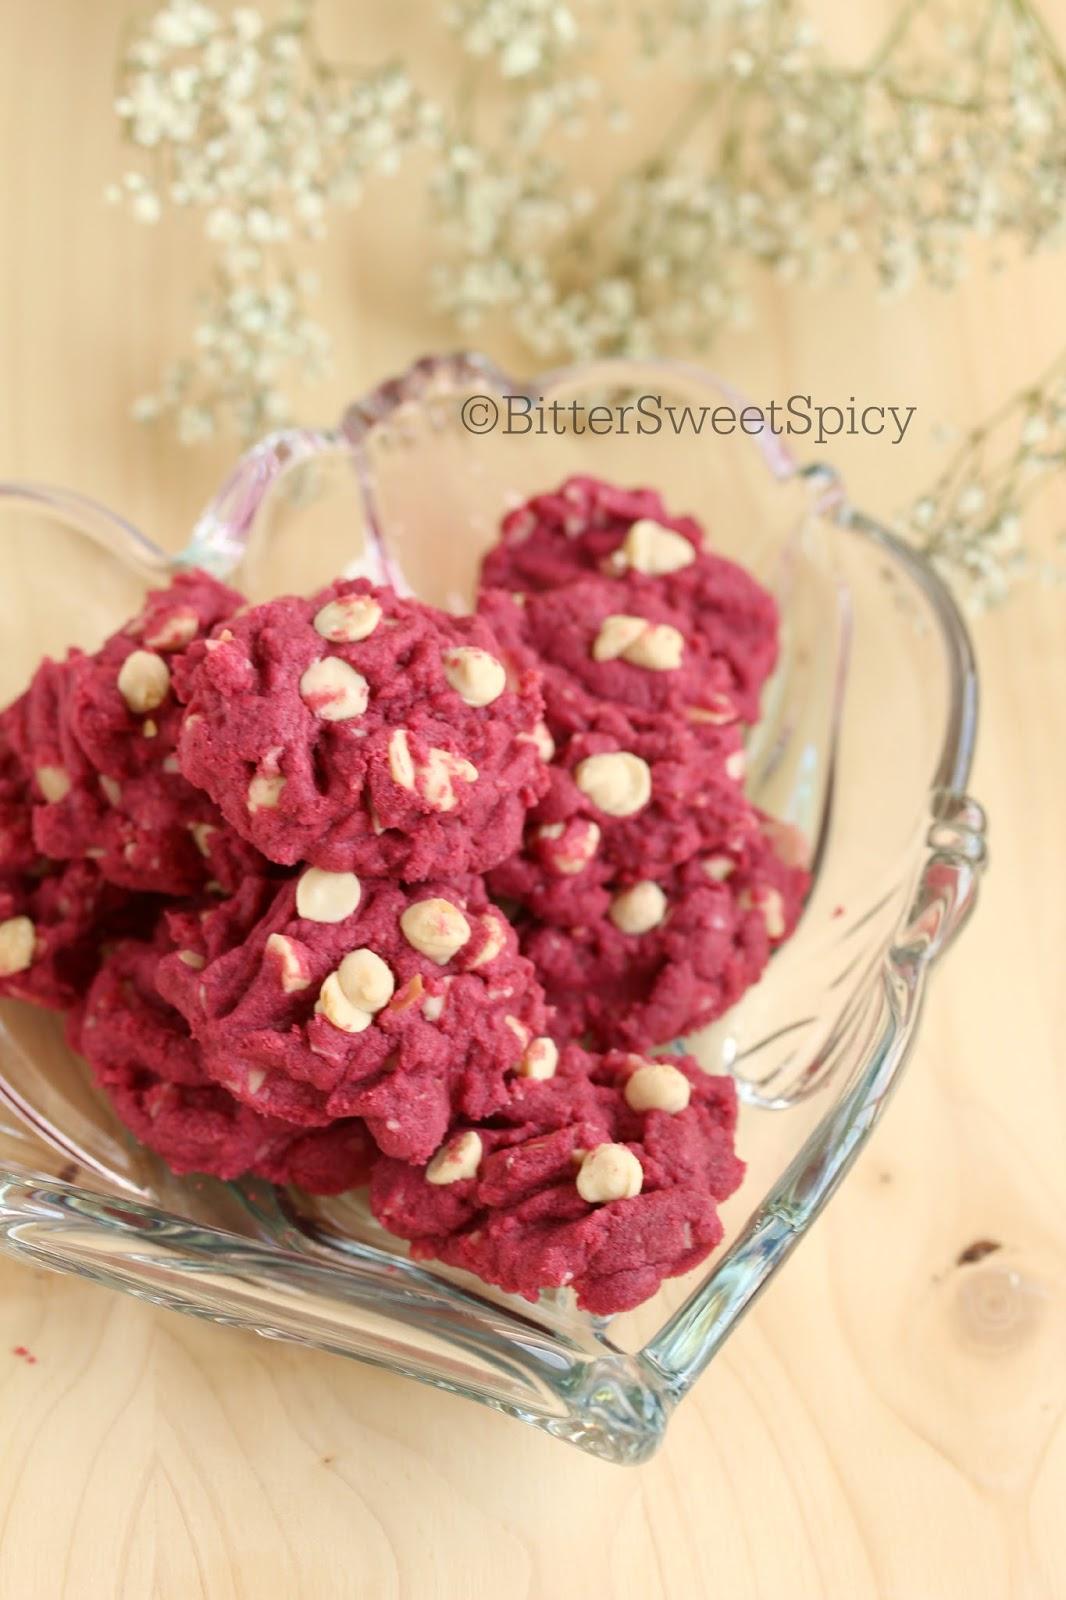 Choc chip cookie recipe plain flour